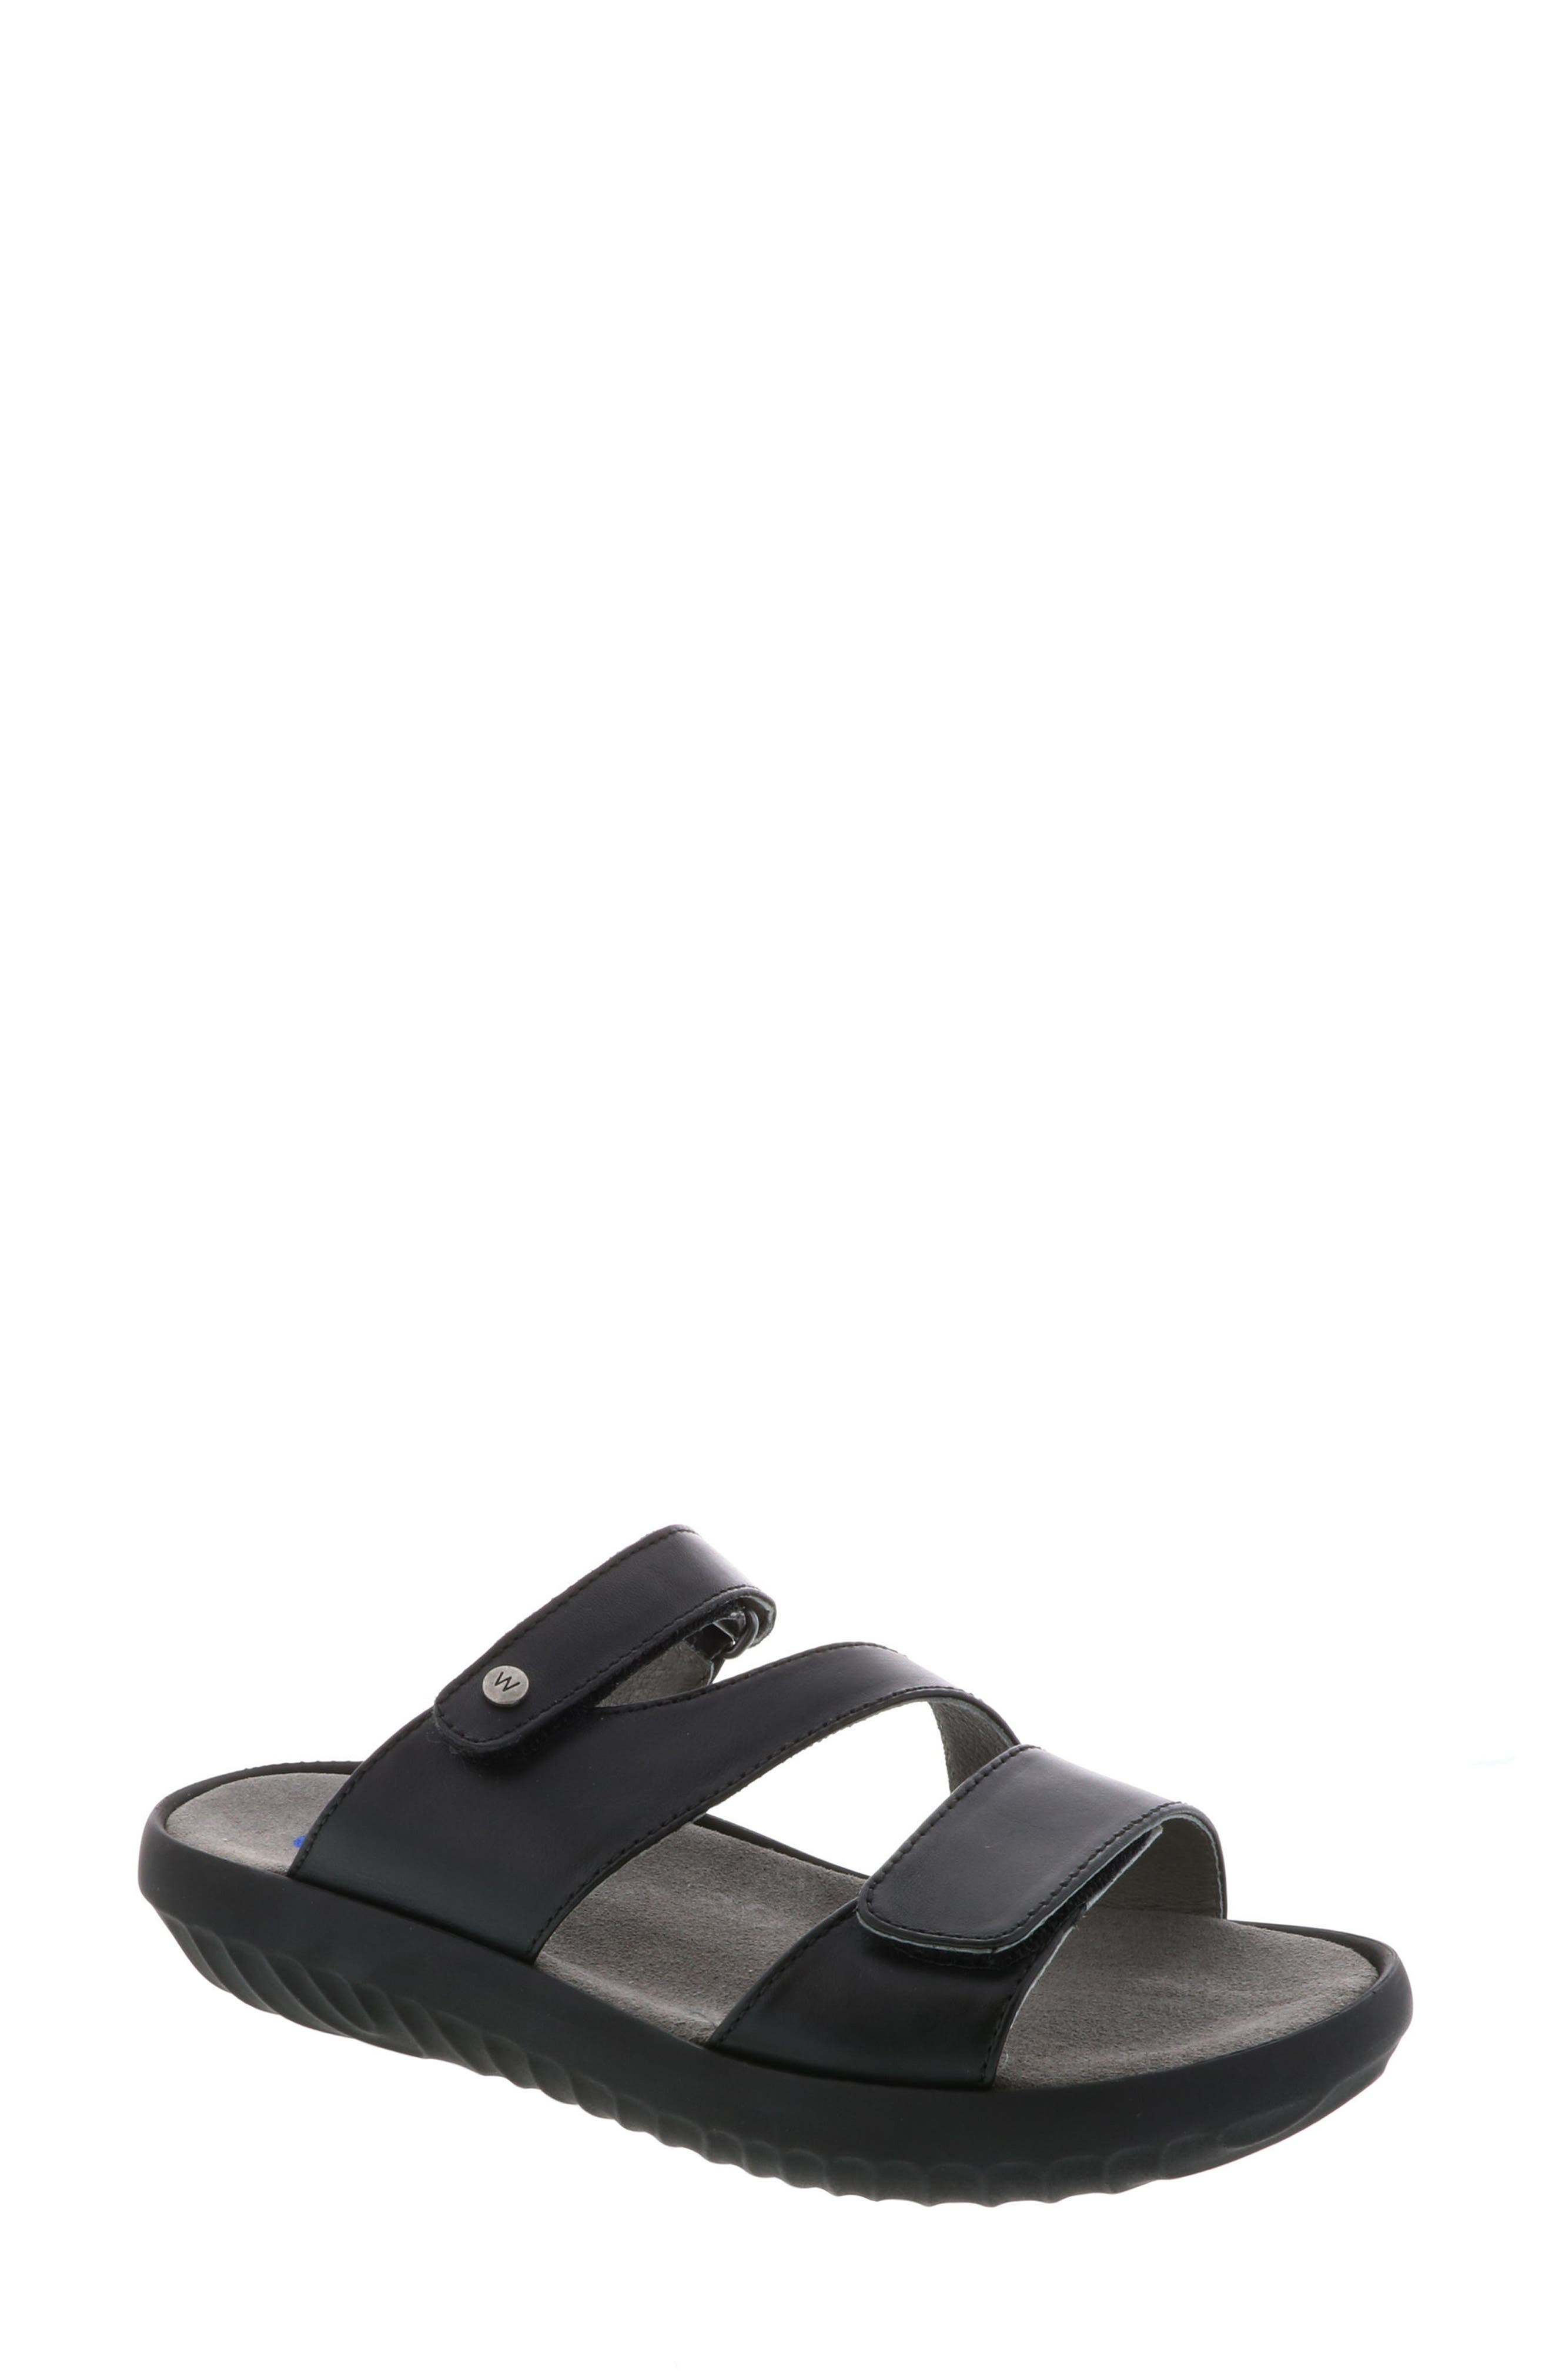 Sense Slide Sandal,                         Main,                         color, BLACK